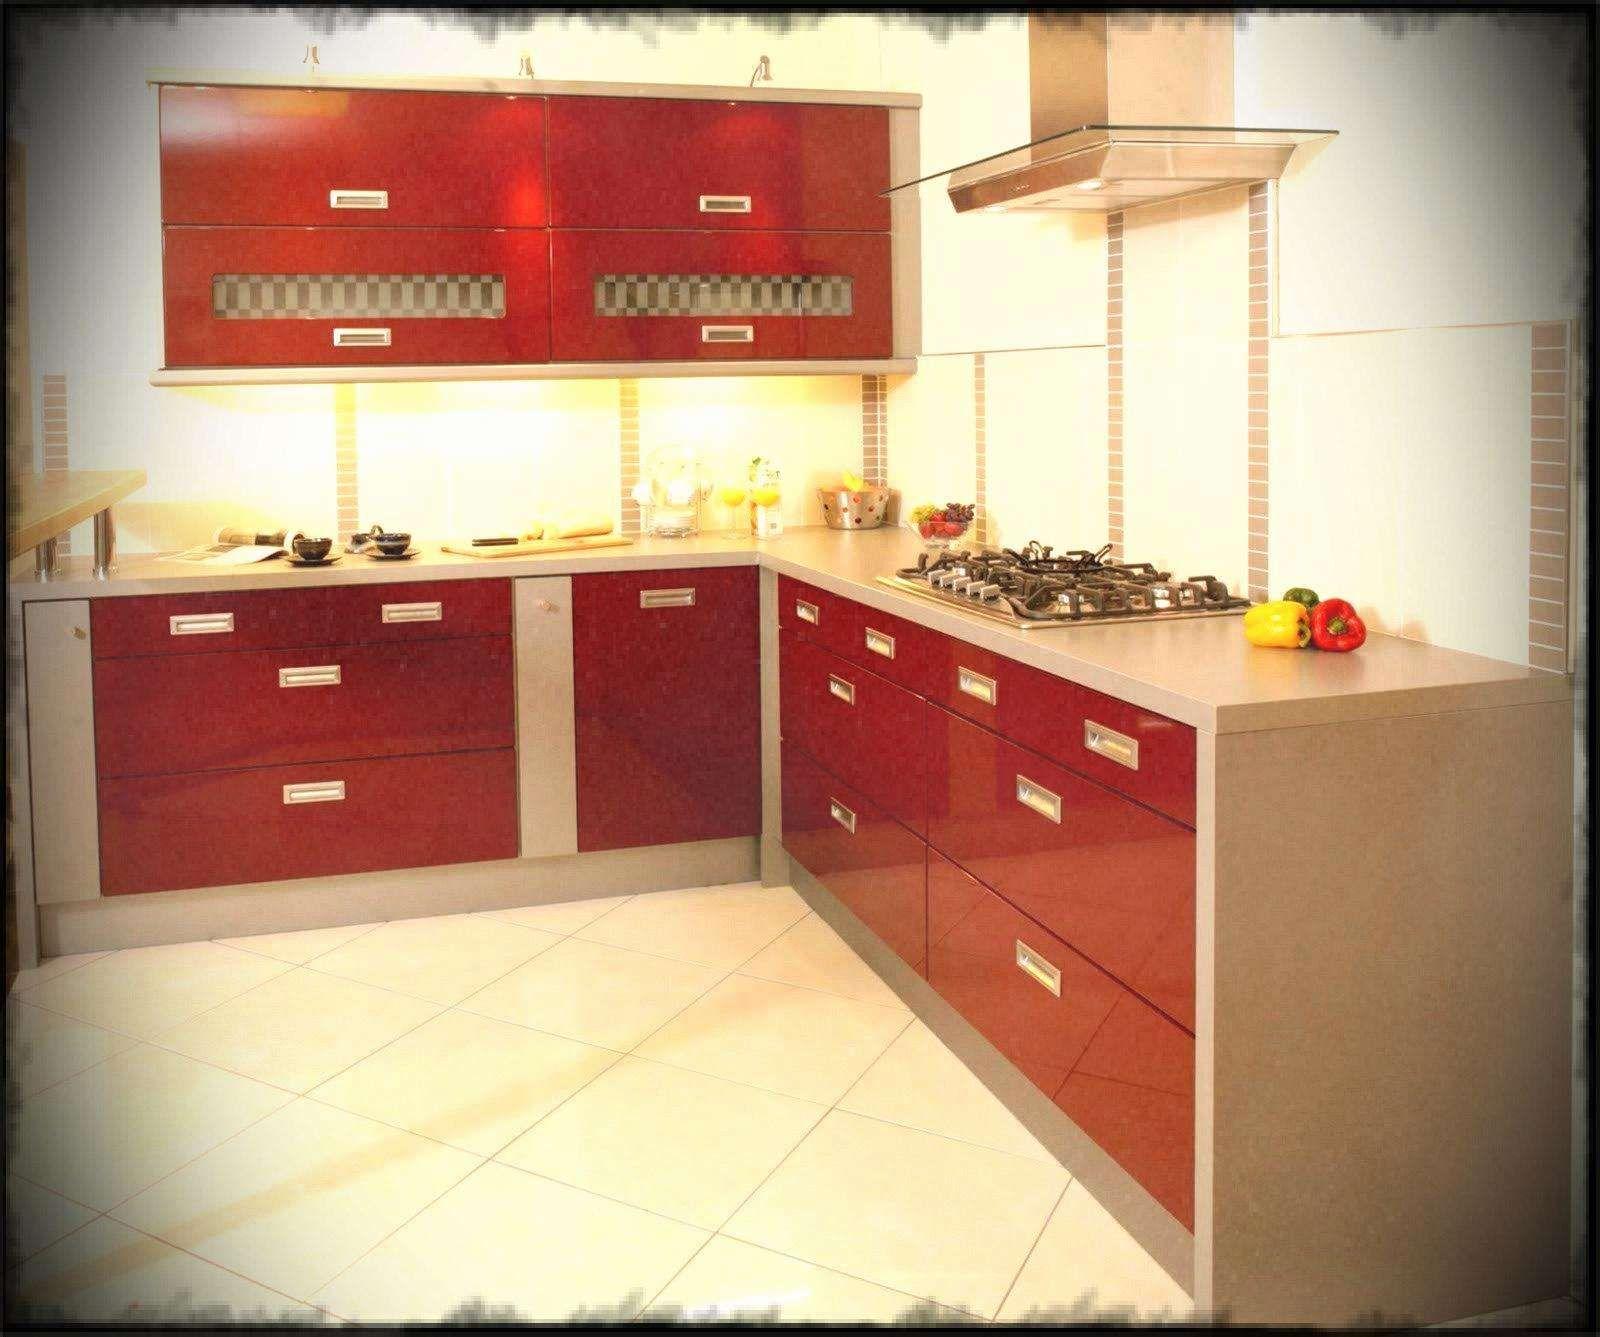 Red Gloss Kitchen Cabinets Fresh Grey Kitchen Island Black And White Cabinets Gloss Ki Simple Kitchen Remodel Simple Kitchen Design Kitchen Remodel Countertops